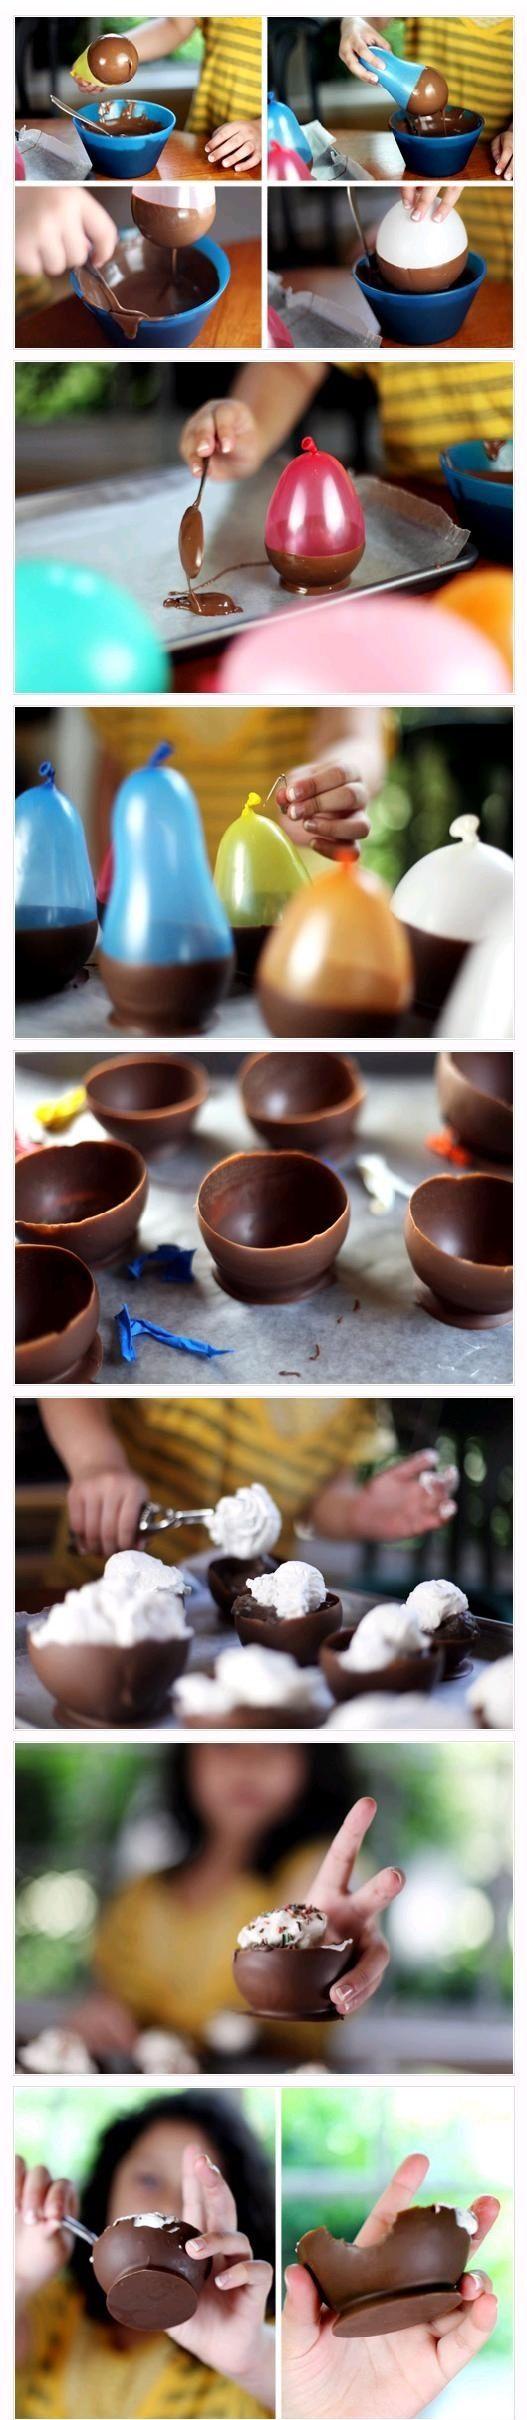 chocolate dessert cups: Desserts Cups, Birthday Parties, Chocolates Cups, Chocolates Desserts, Ice Cream, Chocolates Bowls, Cool Ideas, Great Ideas, Water Balloon